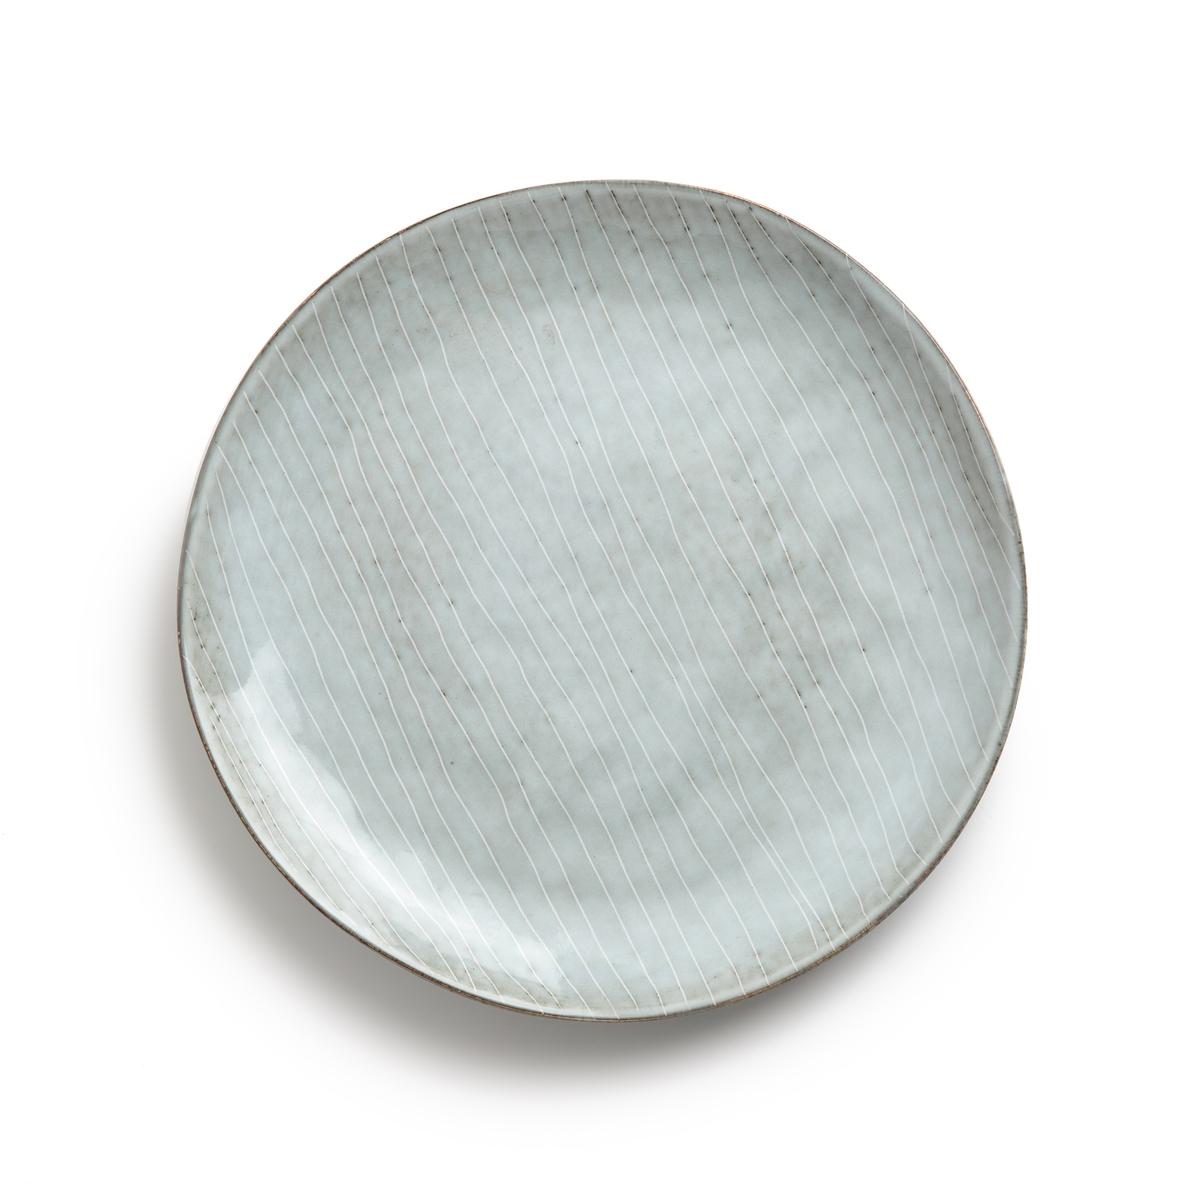 Комплект из 4 мелких тарелок из керамики, Amedras